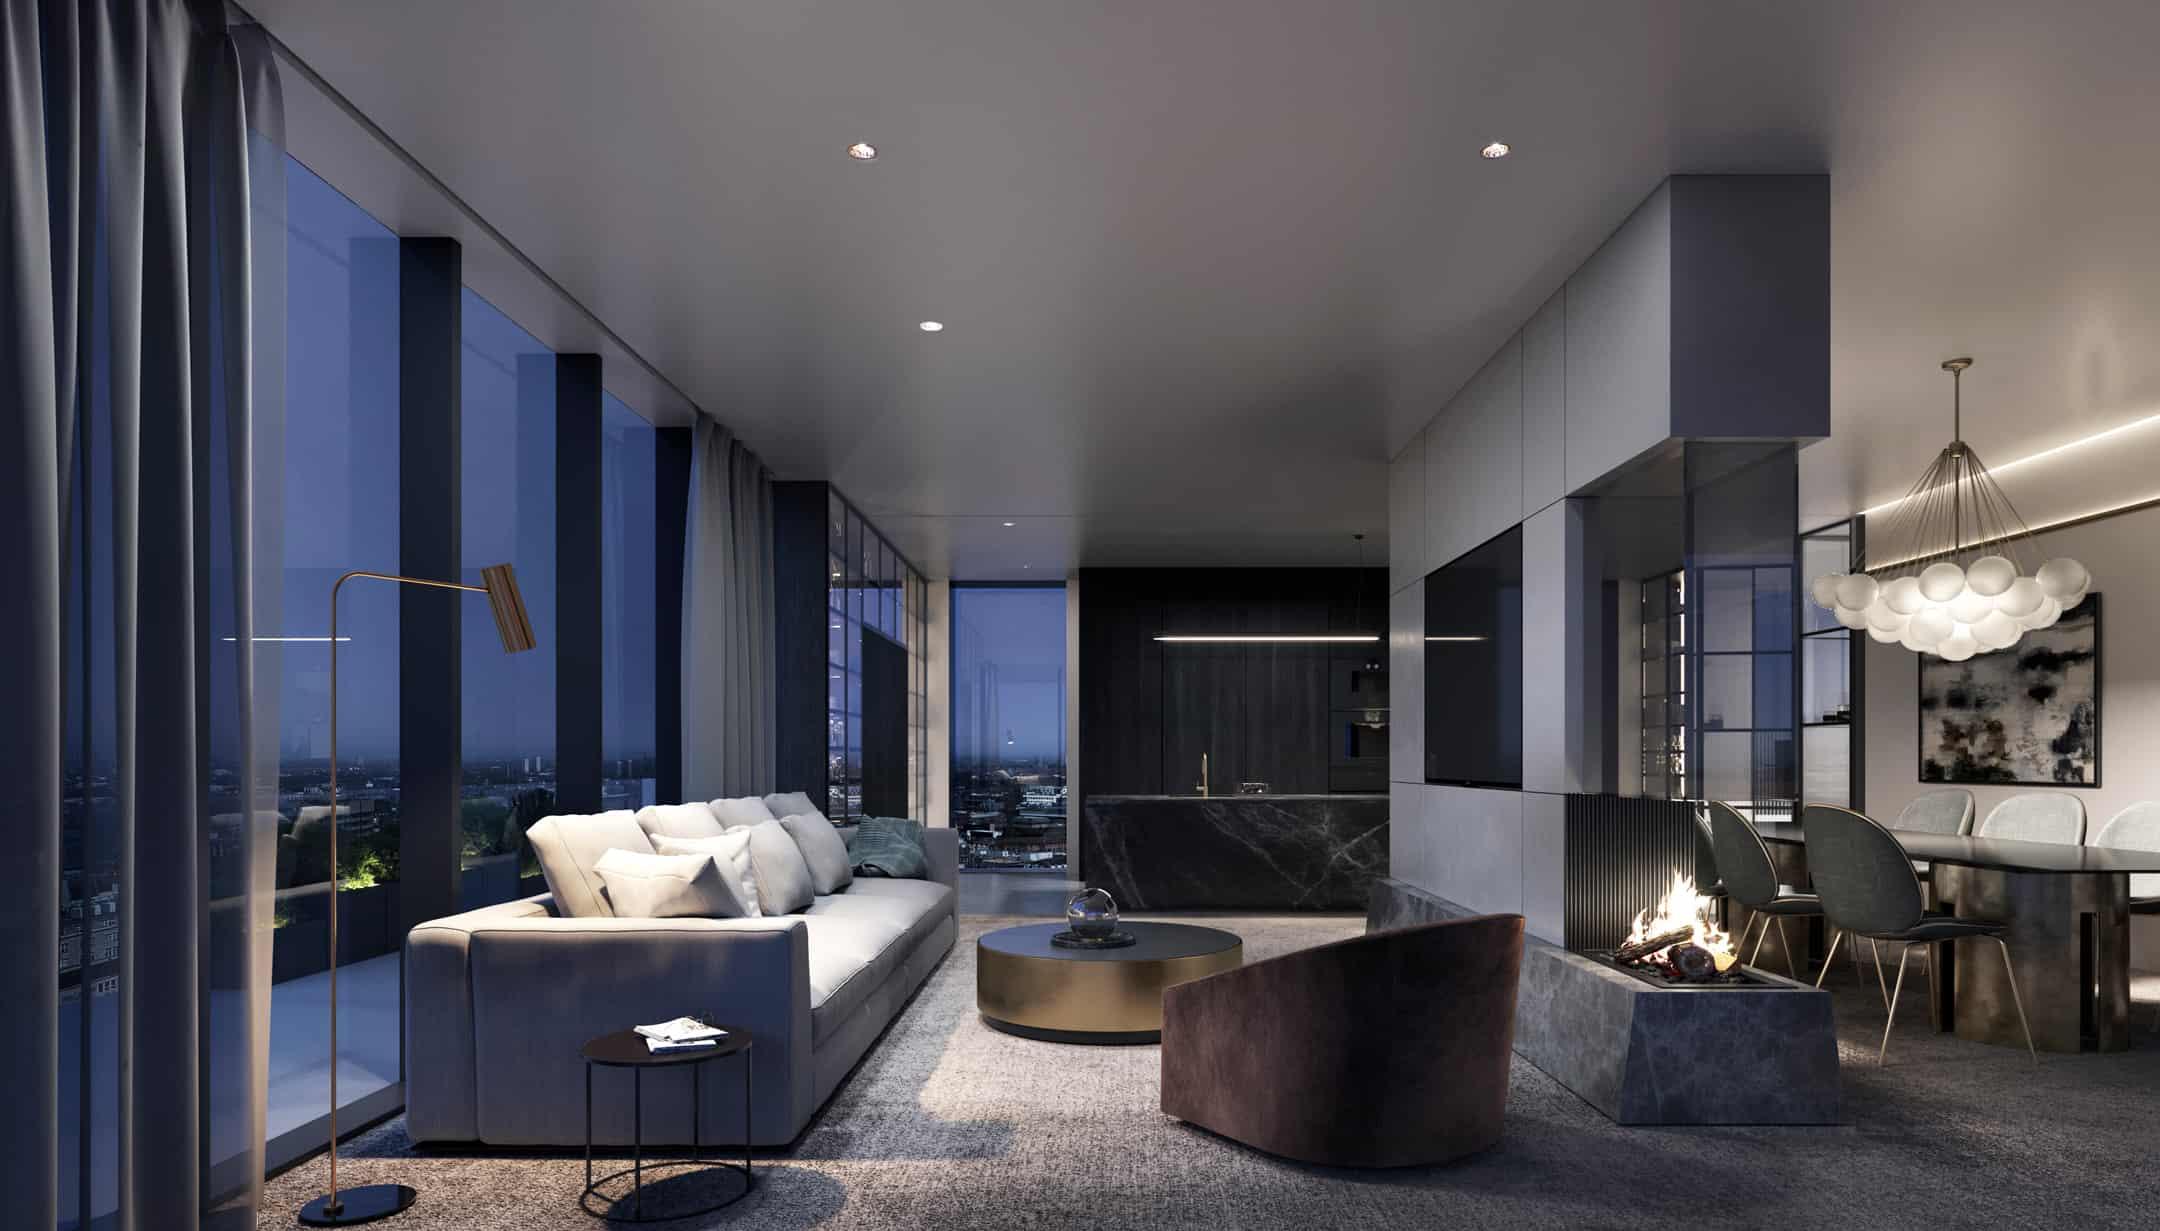 3D rendering services Sydney - Matterhorn Digital